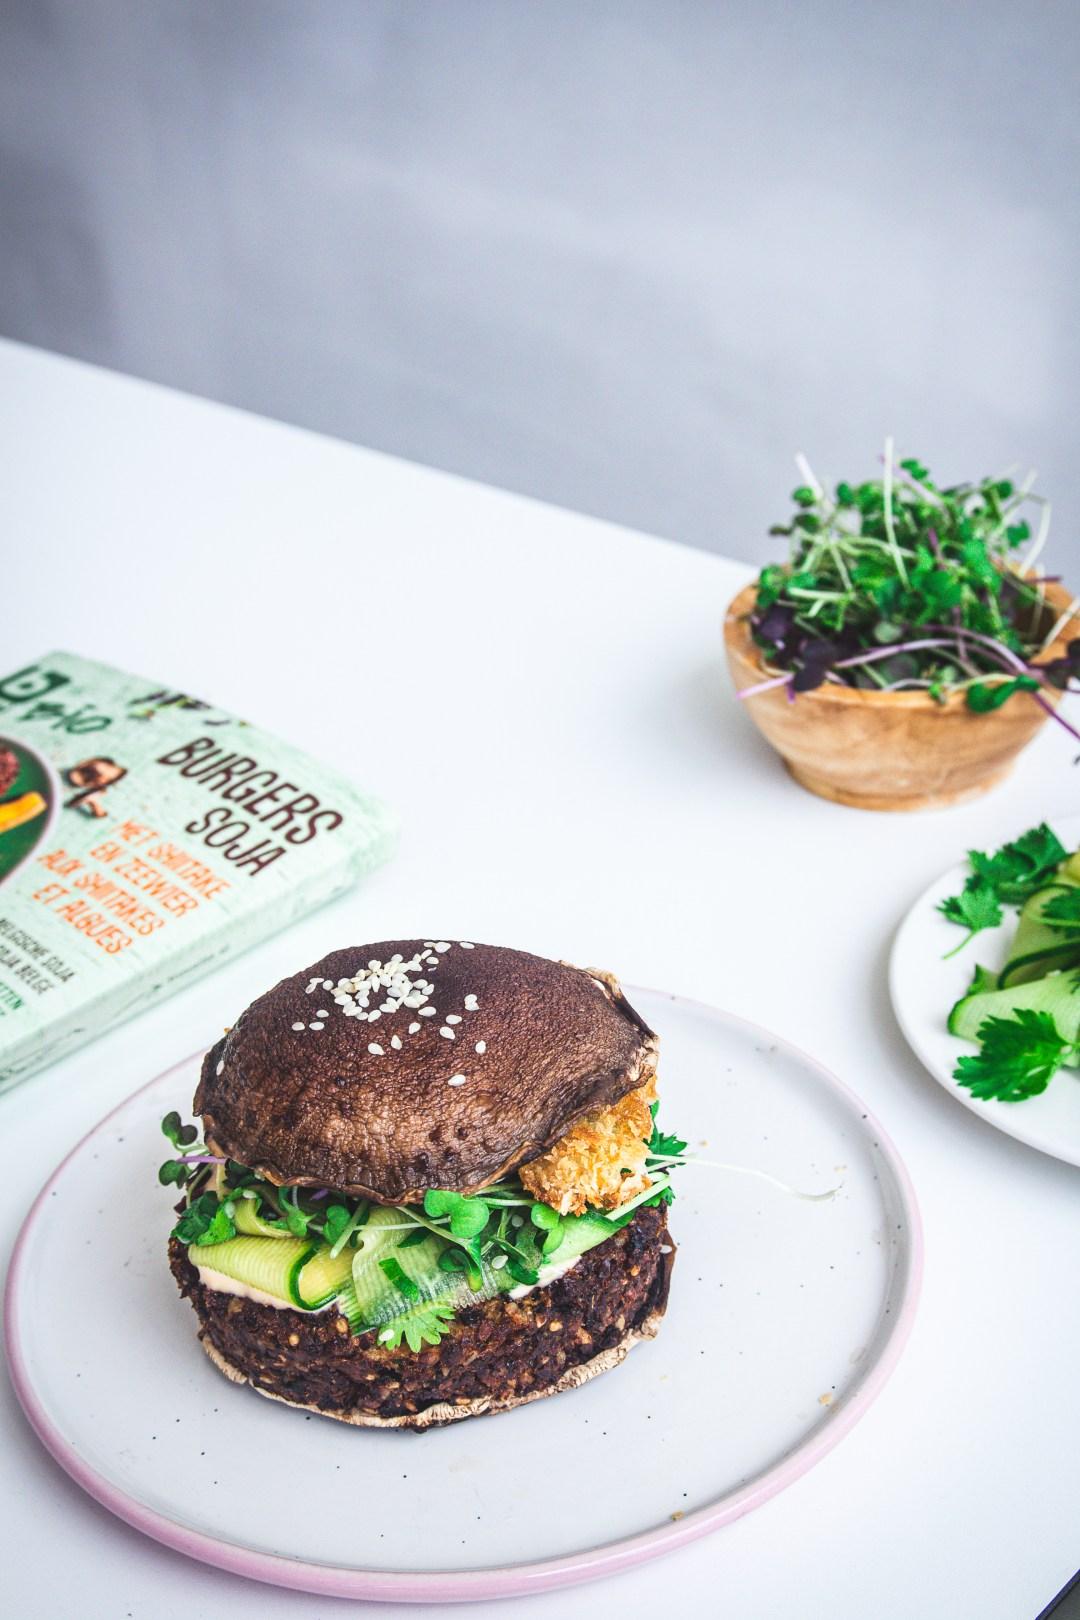 vegan burger sojaburger bioplanet studio goestjes-11.jpg